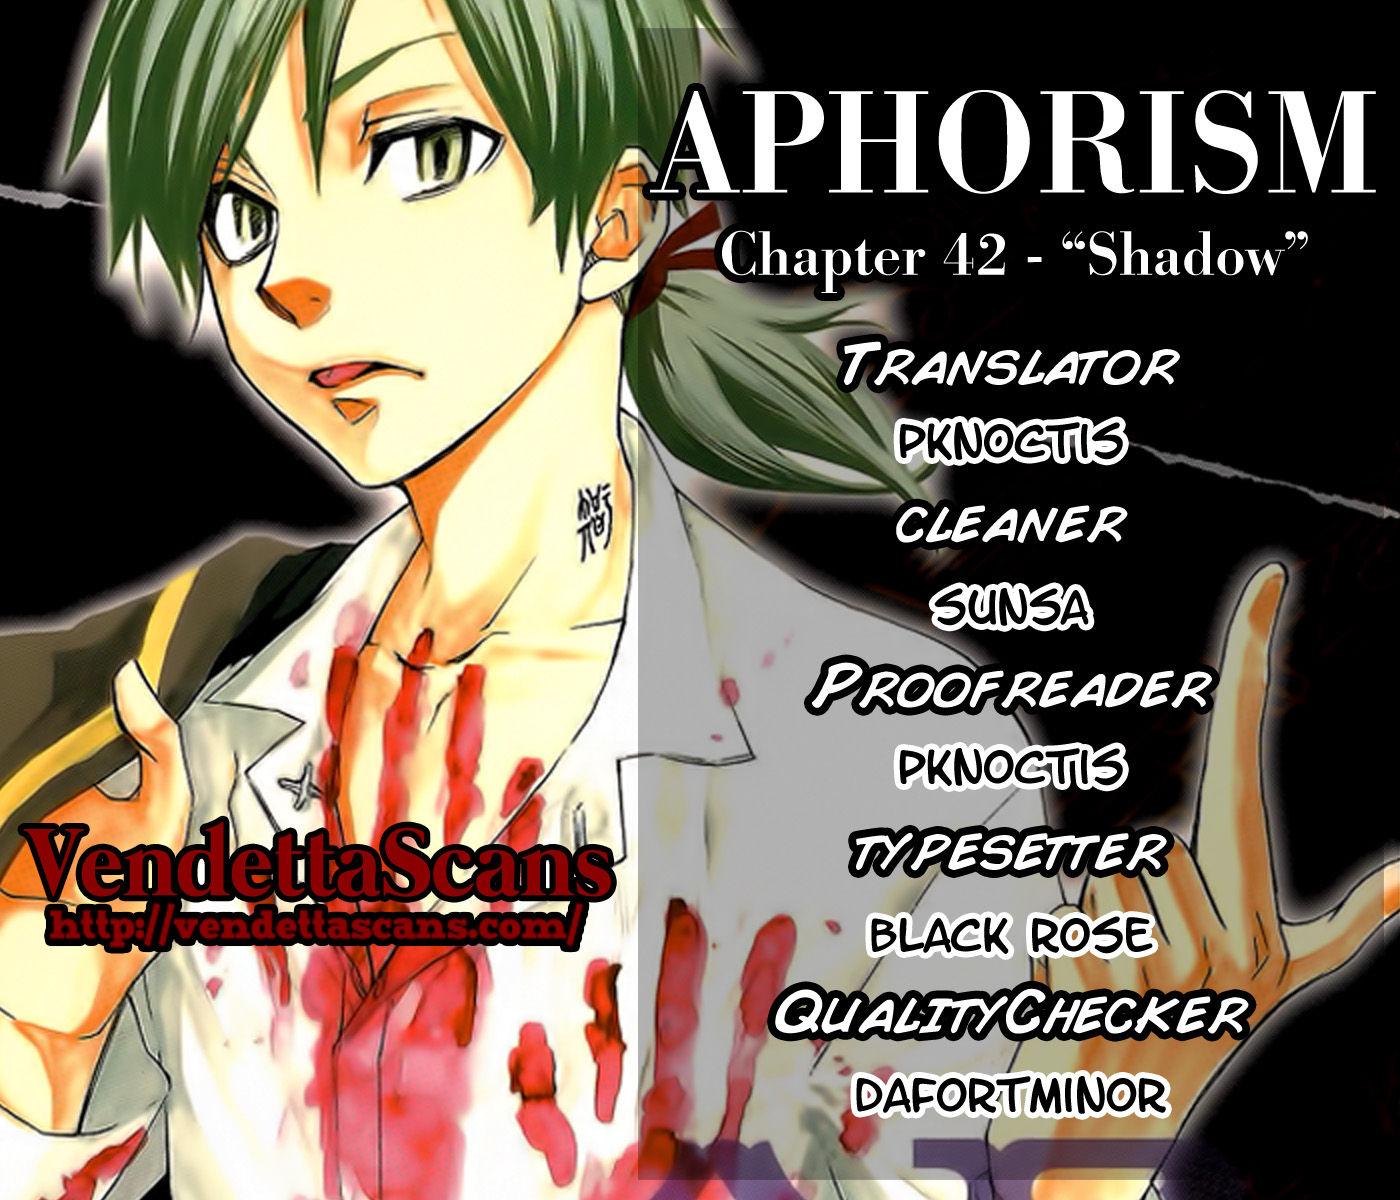 Aphorism 42 Page 2